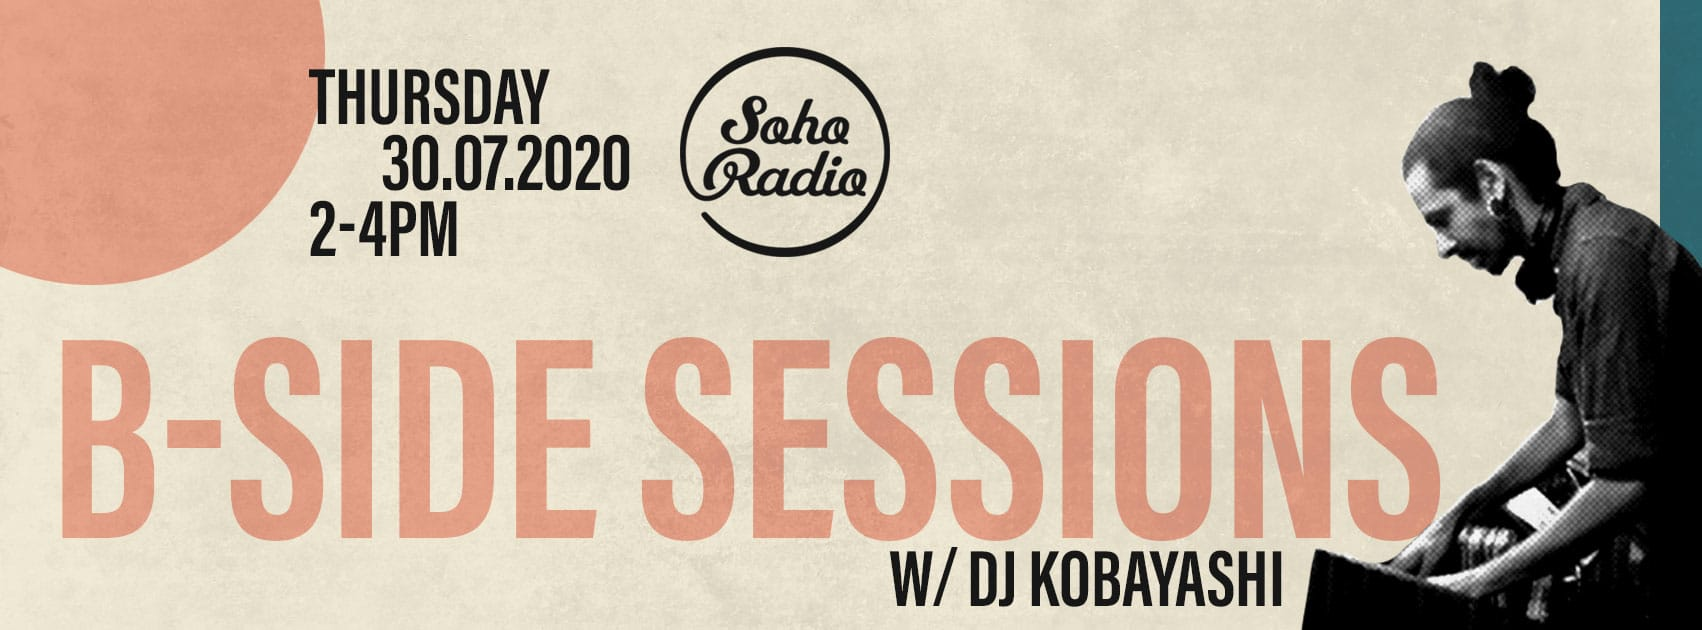 Kingdome of Kaffa on B-side Sessions | Soho Radio